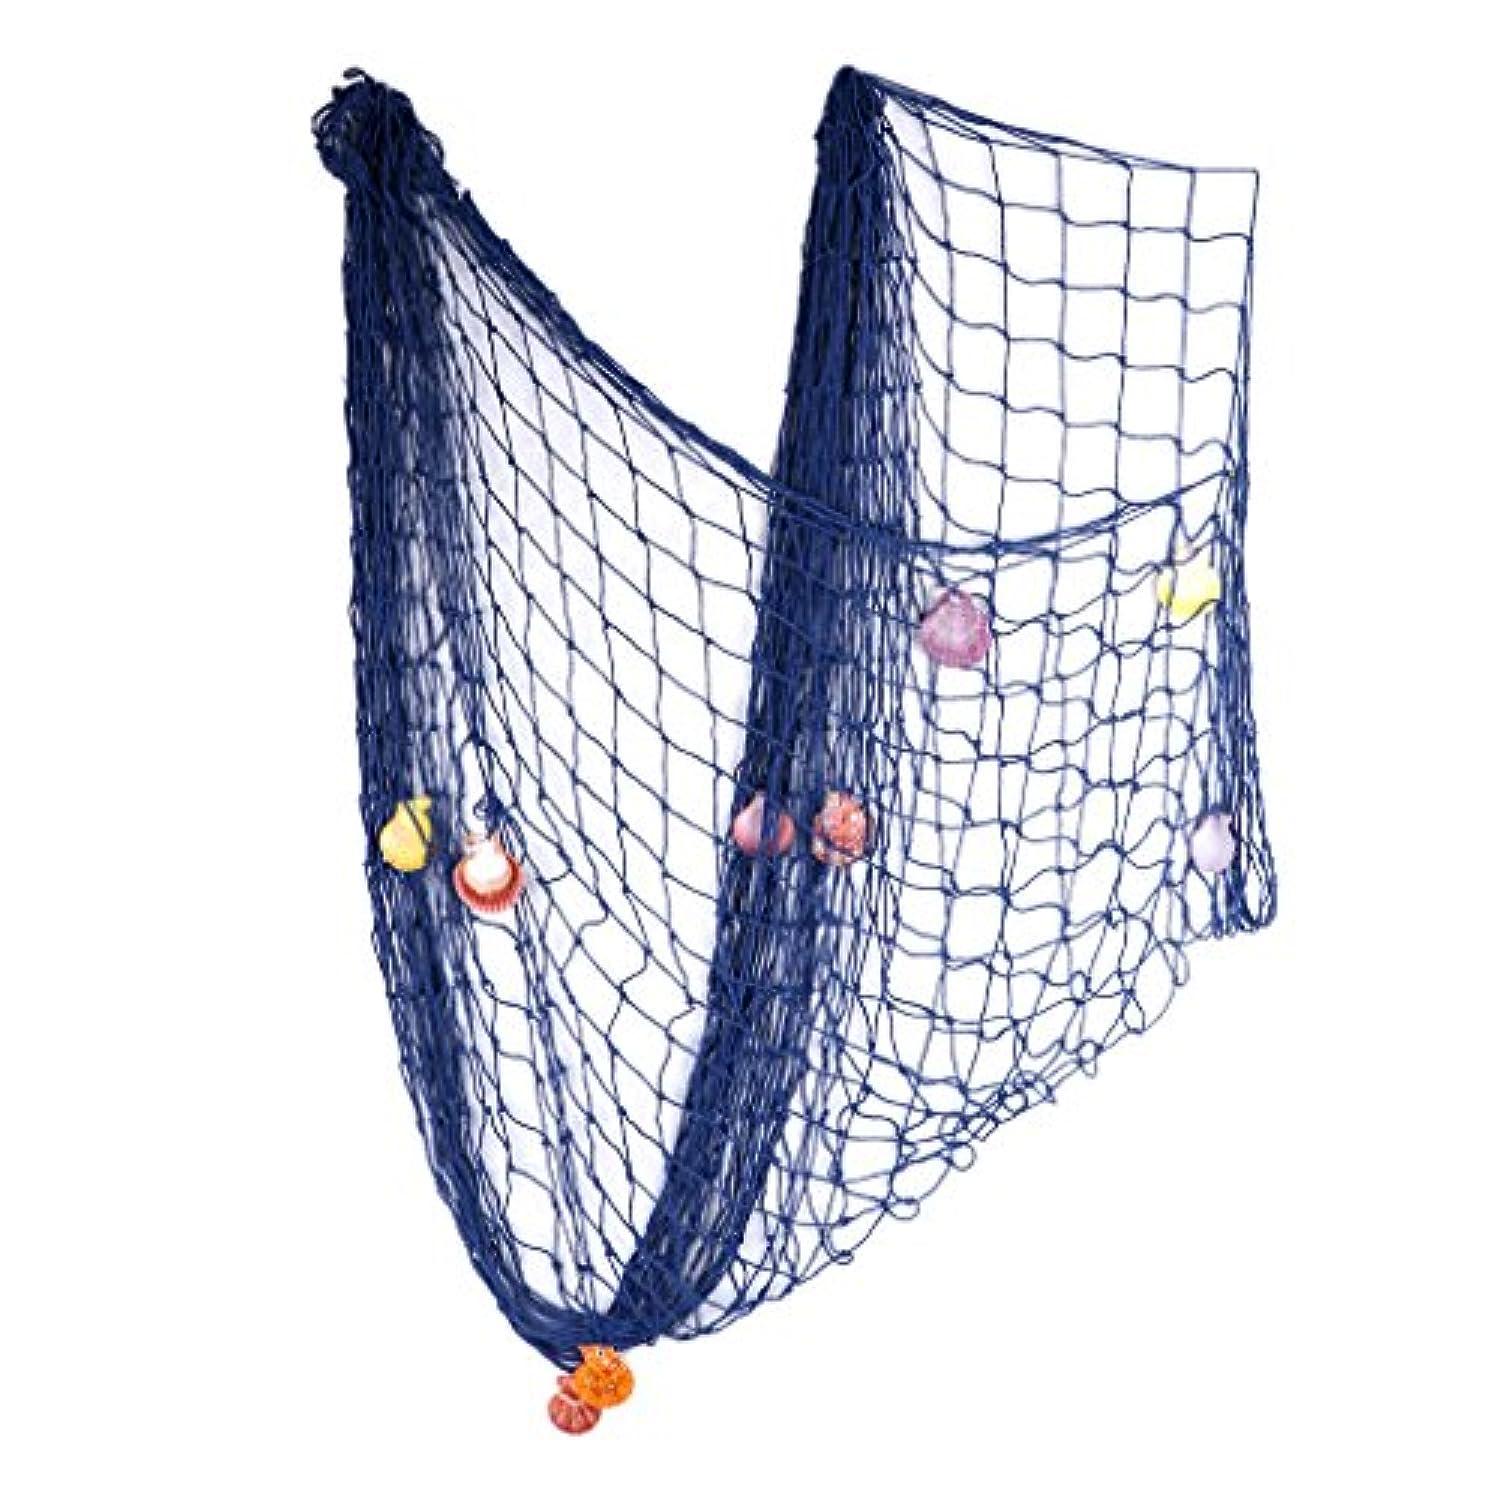 Redriver地中海スタイル装飾Fish Net with Shellsホーム航海の装飾ブルー新しい